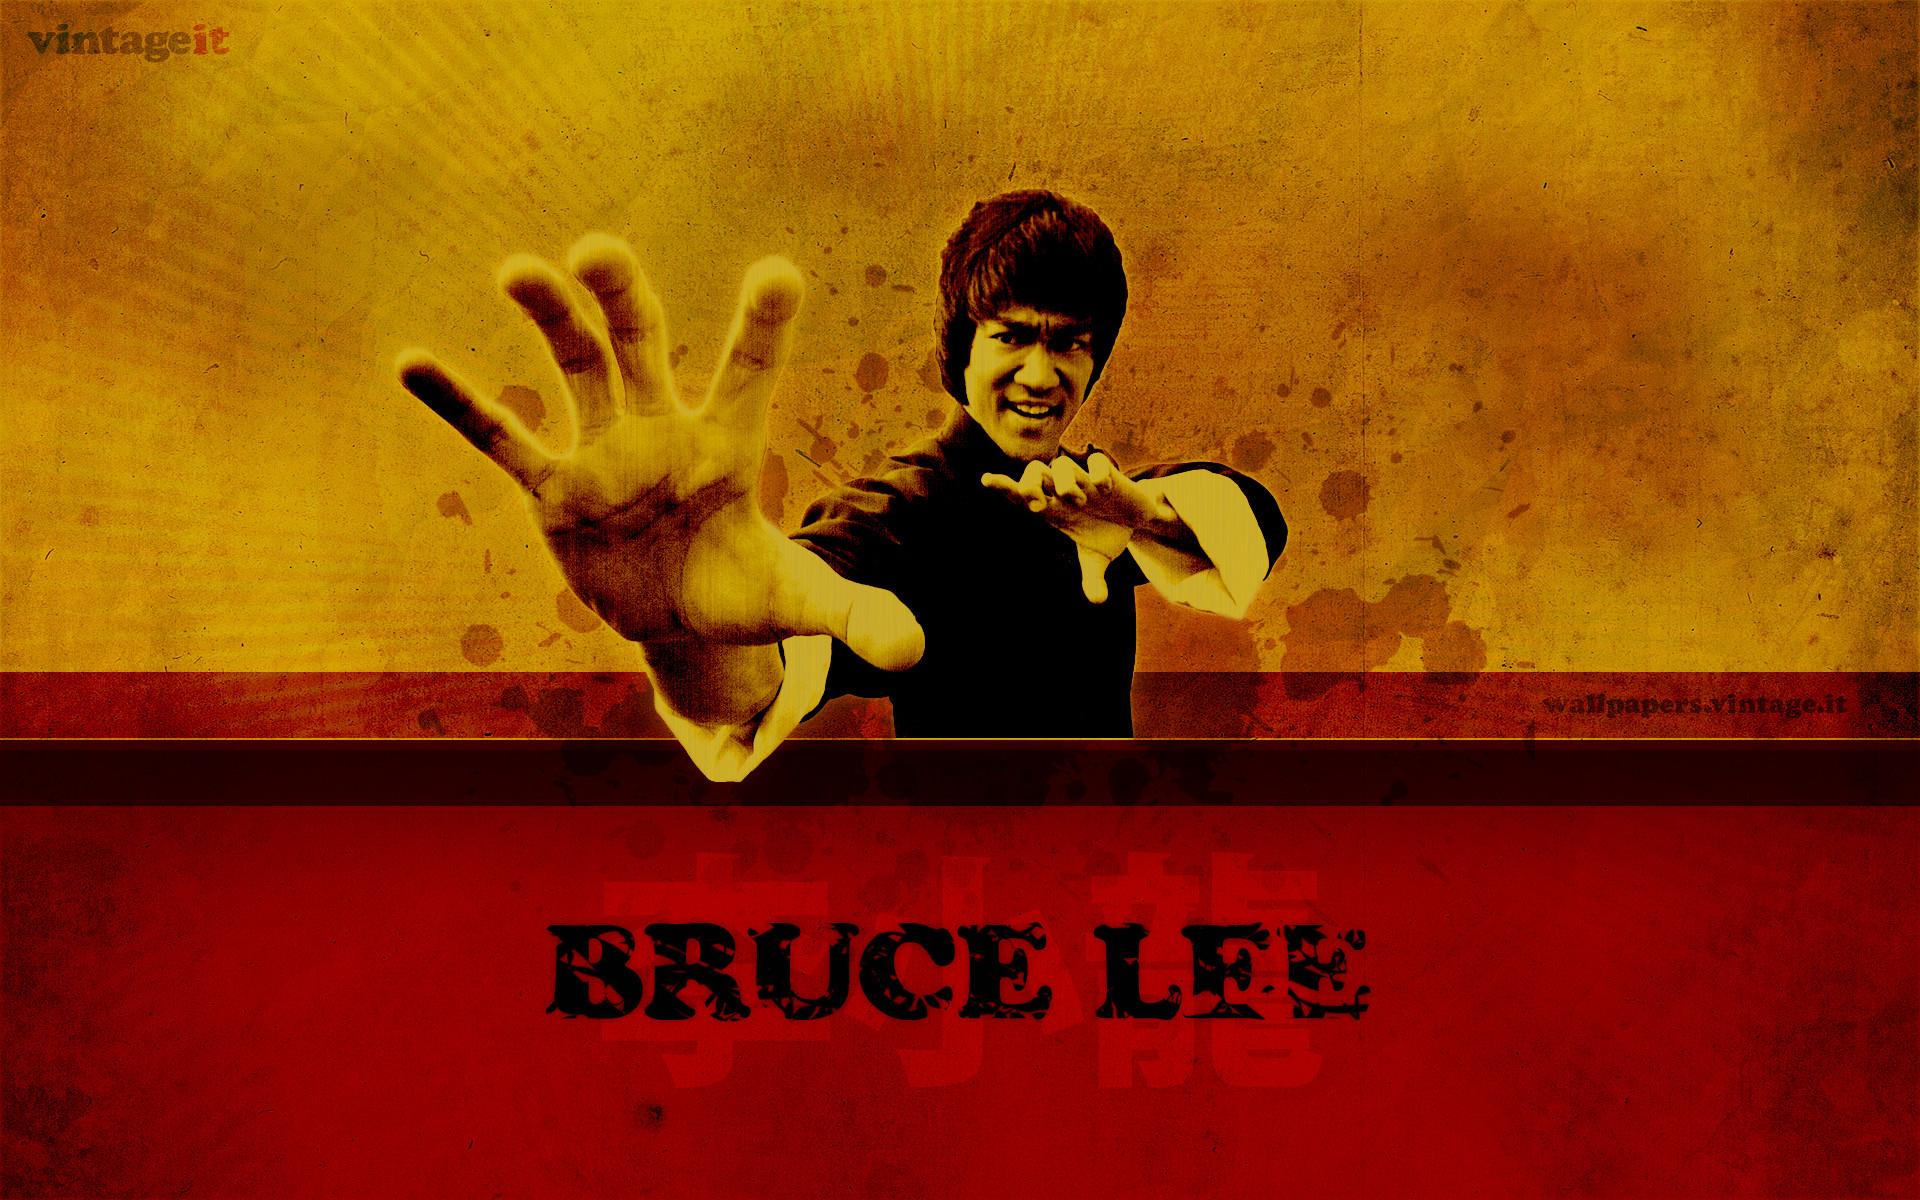 Bruce Lee Wallpaper Wallpapertag